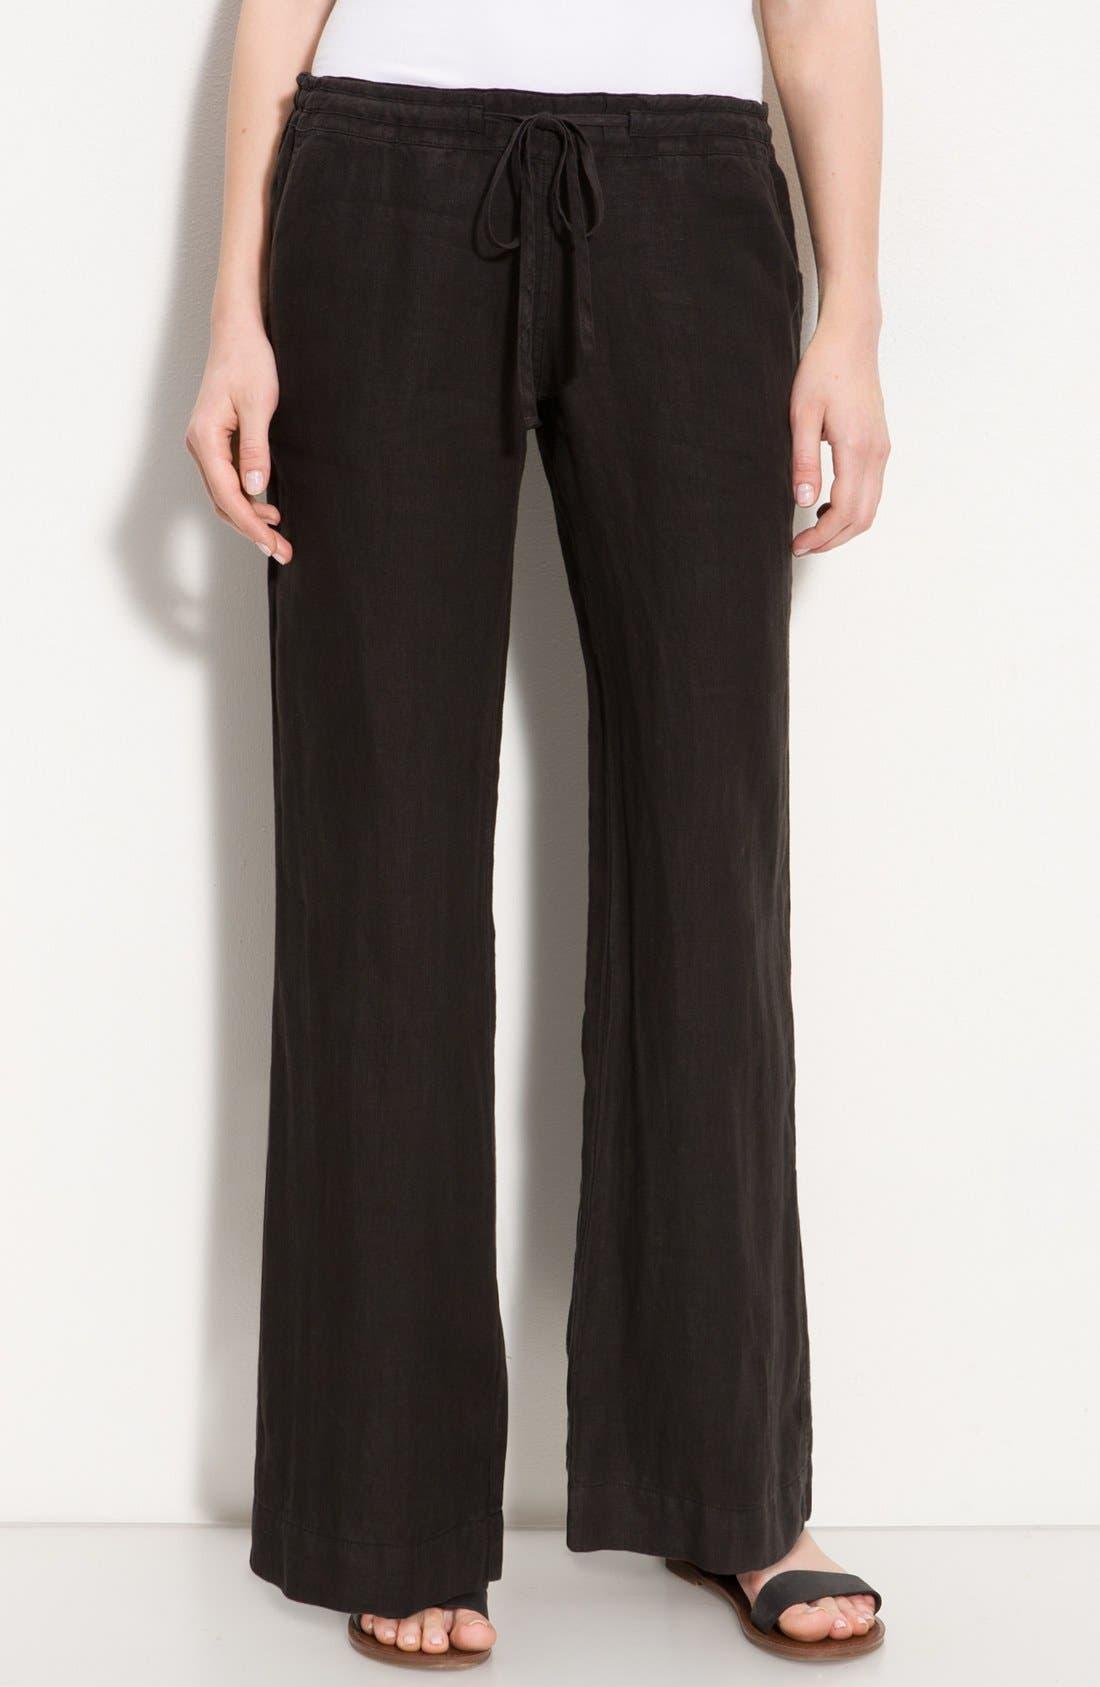 Alternate Image 1 Selected - Allen Allen Drawstring Linen Pants (Petite)